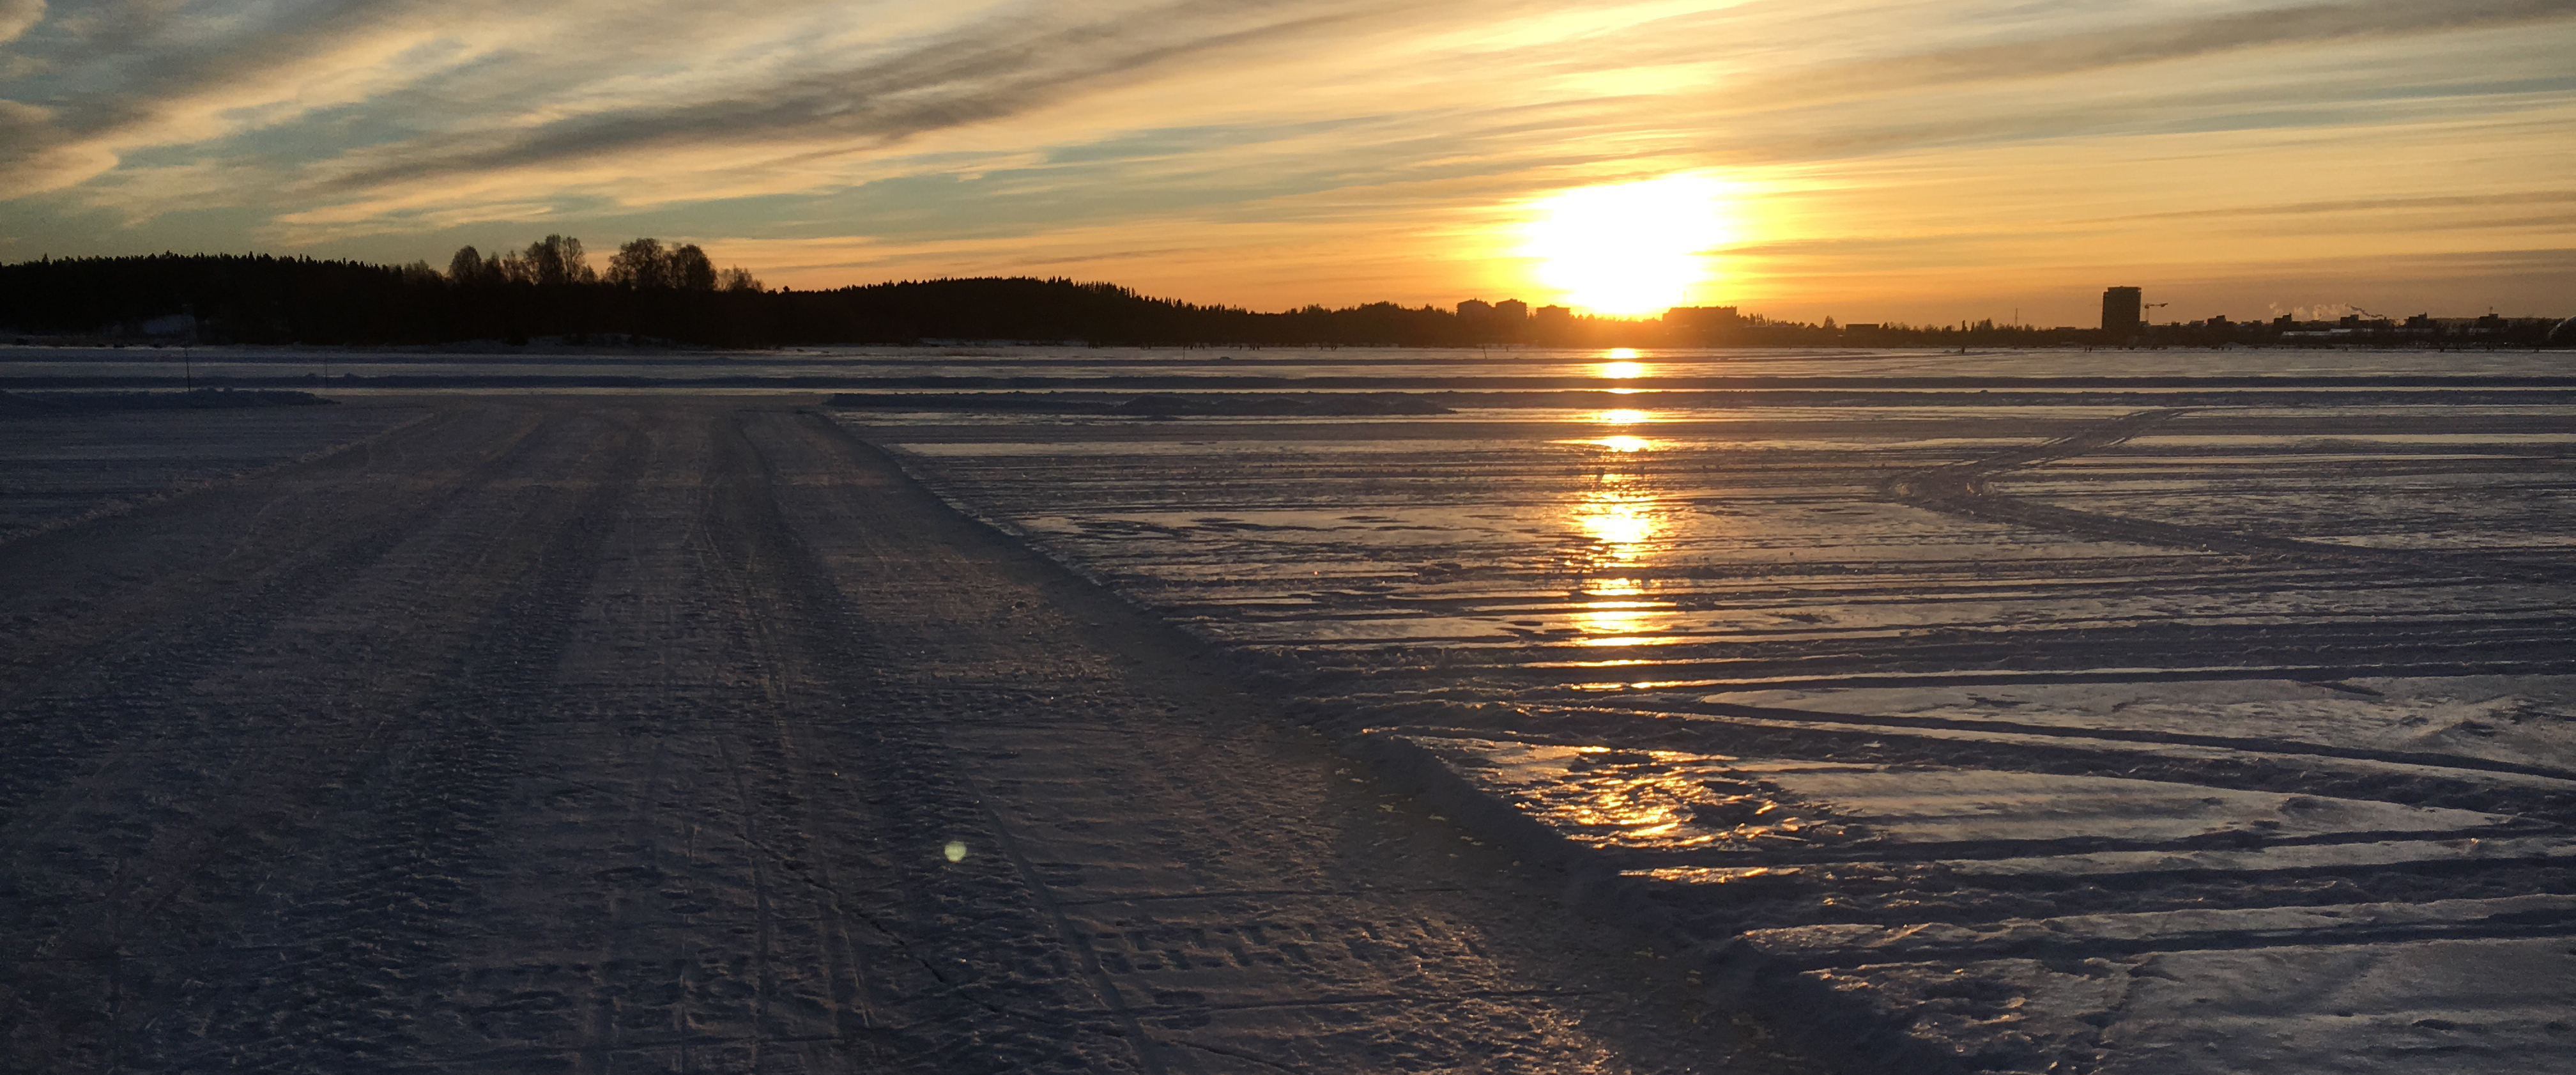 Vintervatten i vintersol - kj-1170x488